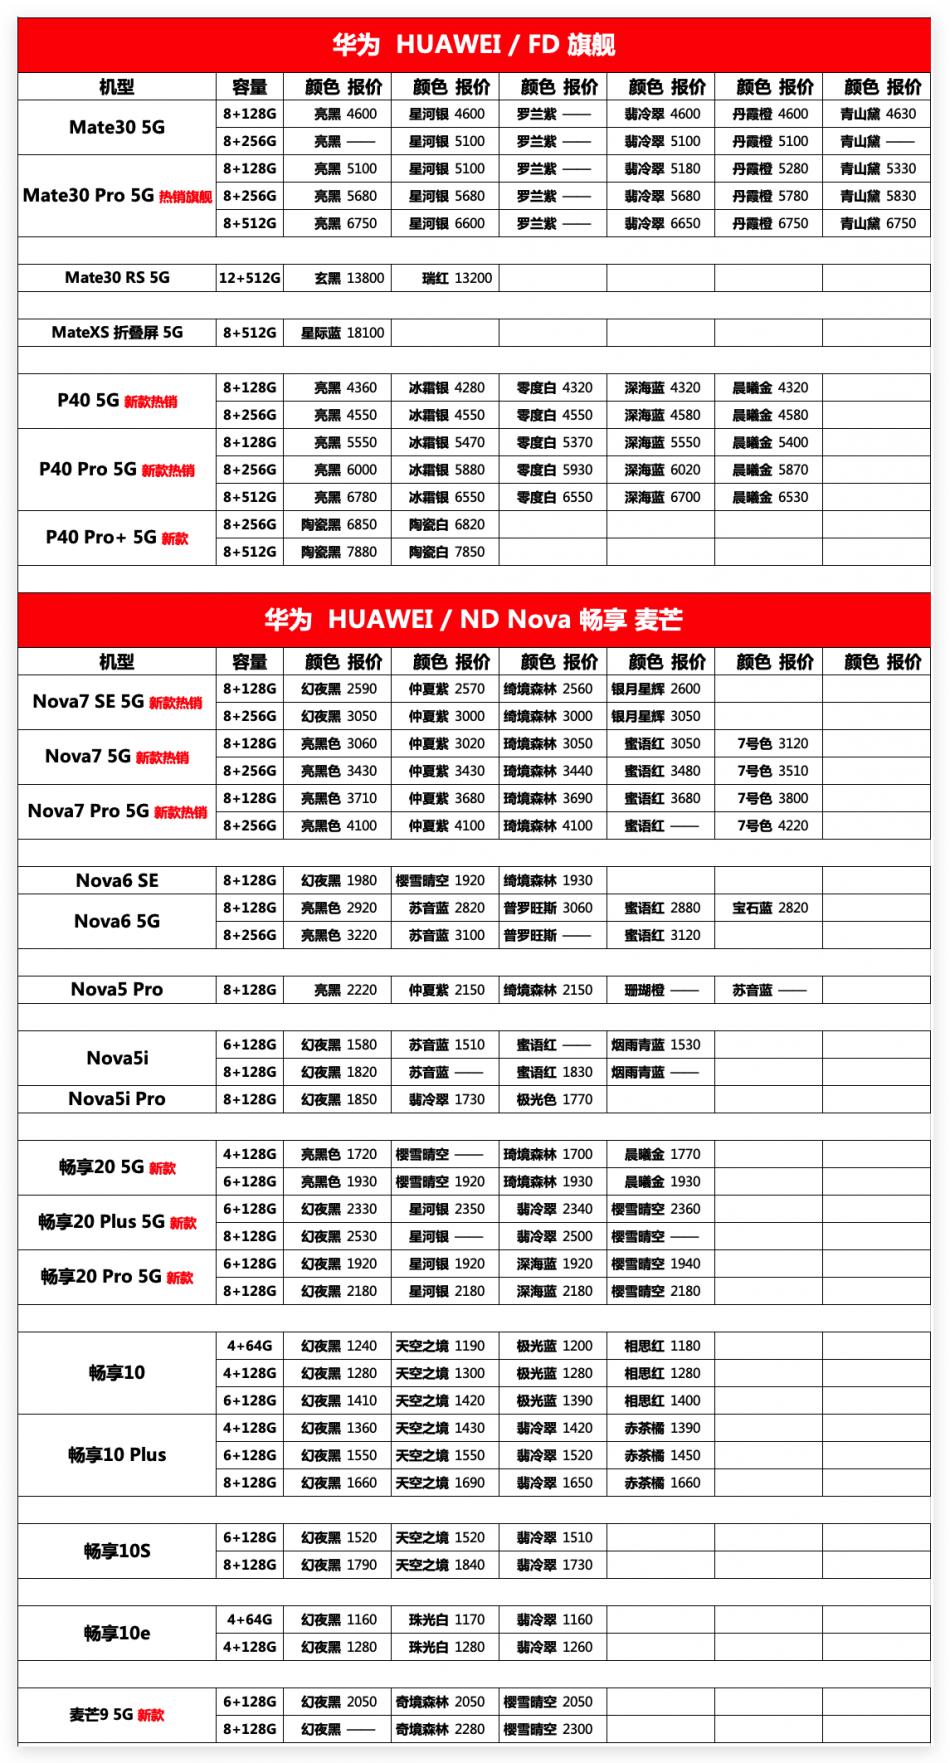 Xnip2020-10-15_14-54-11.png